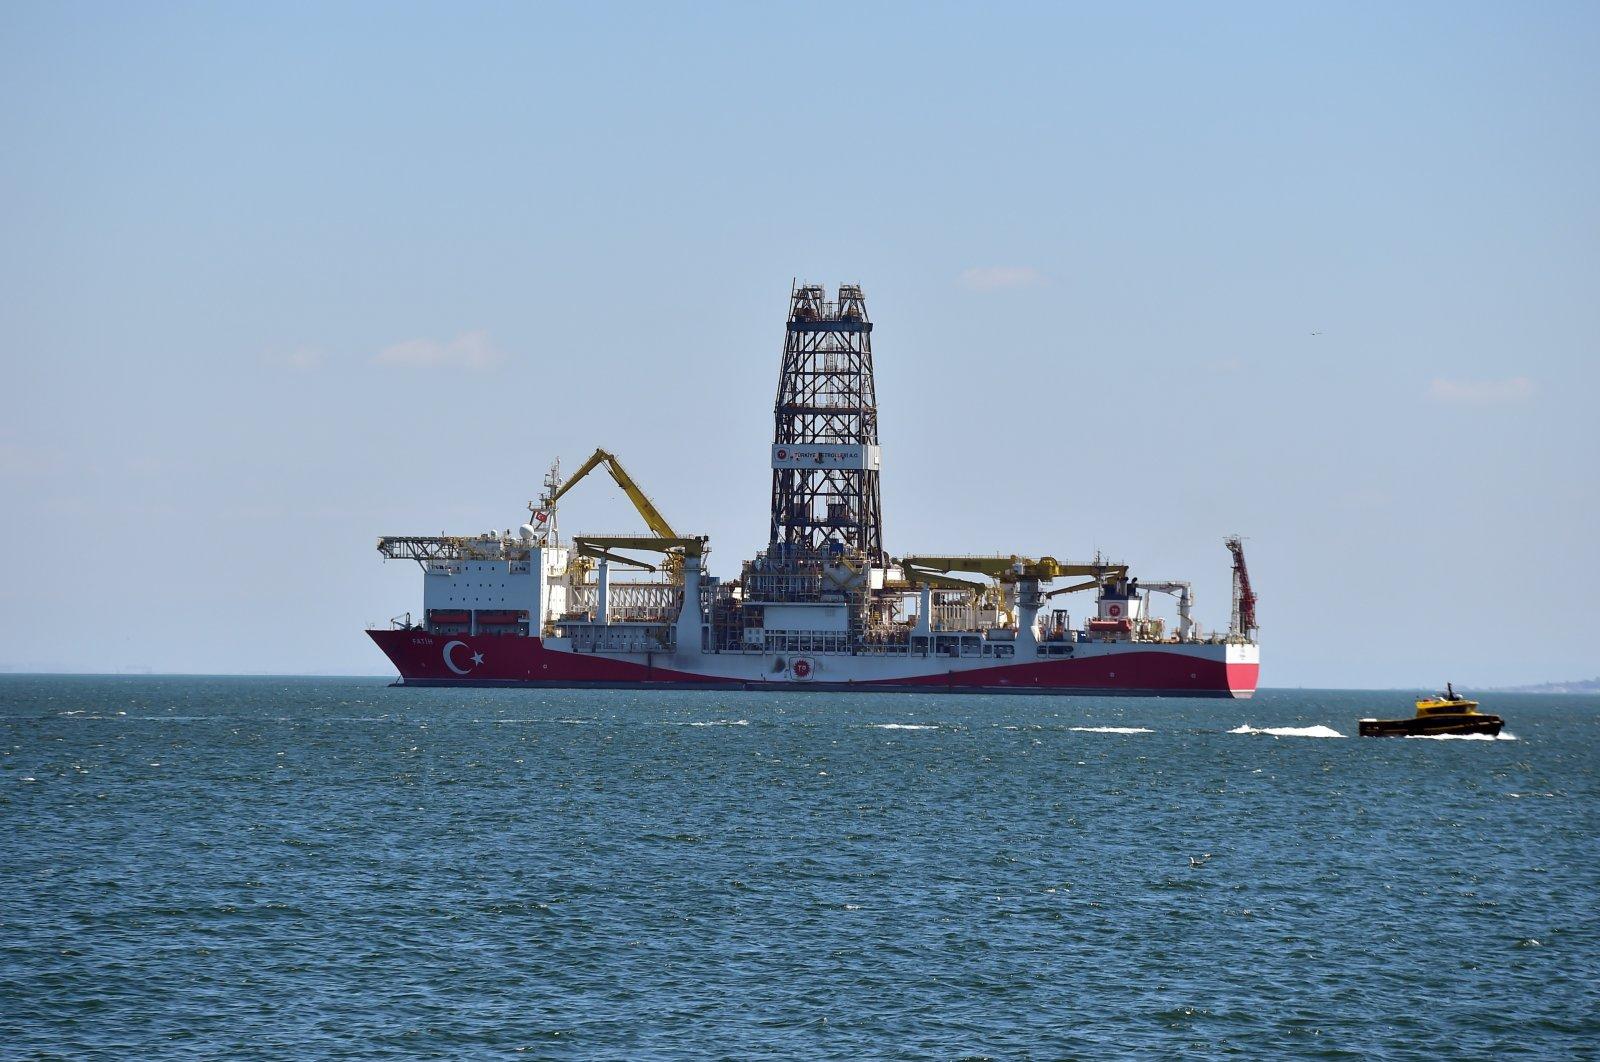 Turkey's Fatih drillship is seen off the shores of Istanbul, Turkey, April 9, 2020. (IHA Photo)